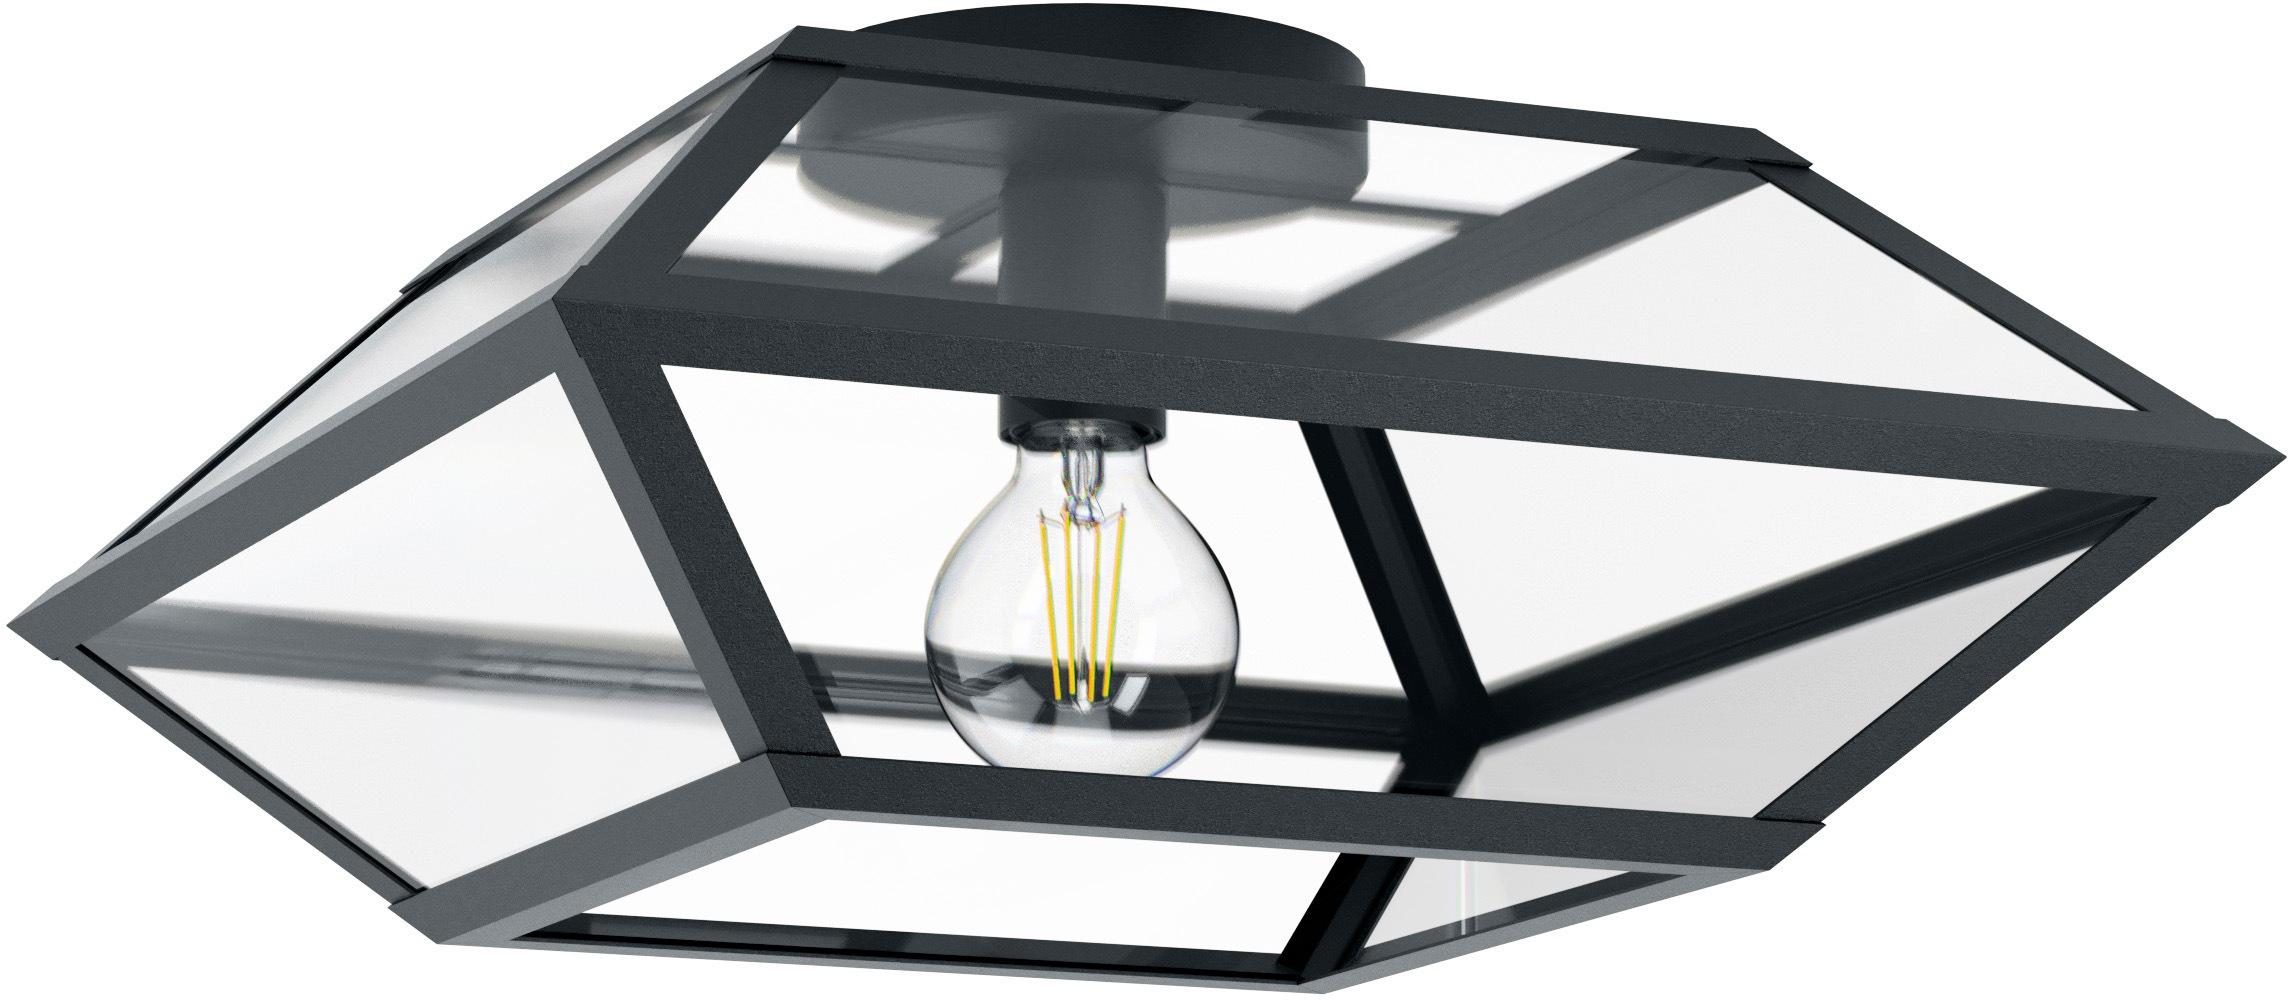 EGLO Deckenleuchte CASEFABRE, E27, Deckenlampe